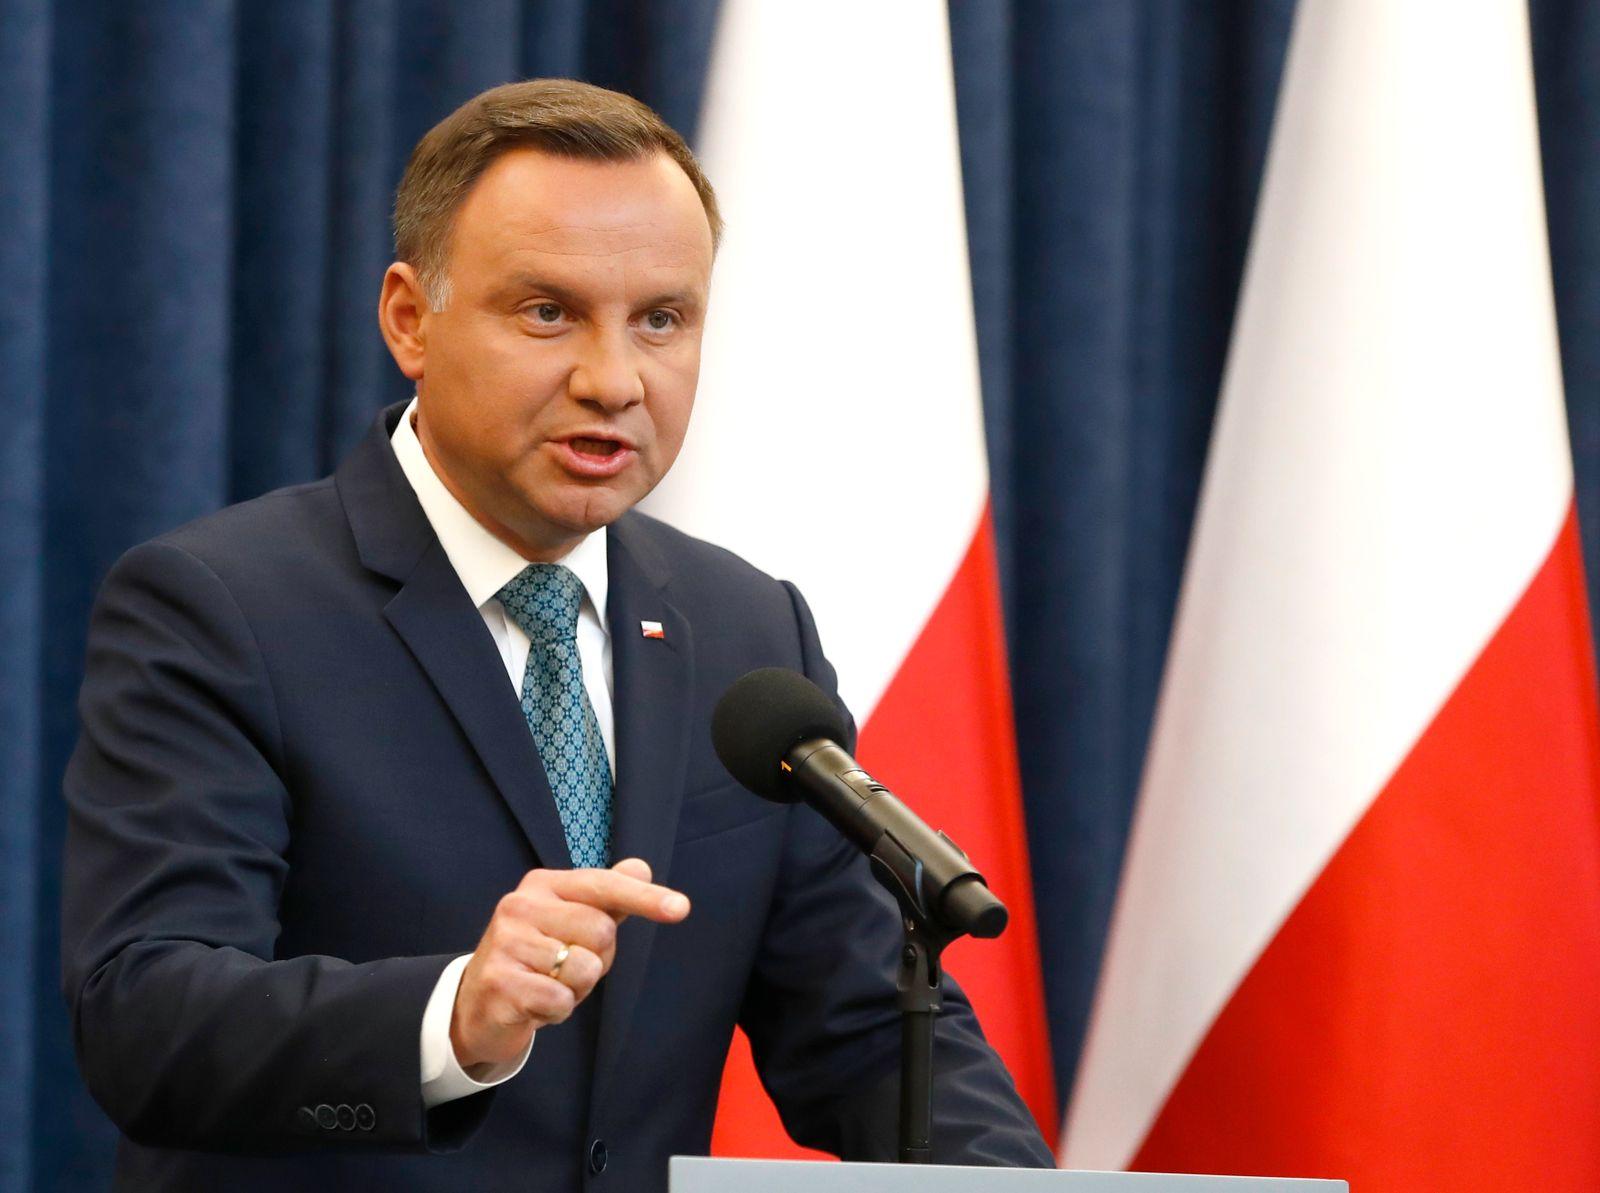 POLAND-POLITICS/JUDICIARY